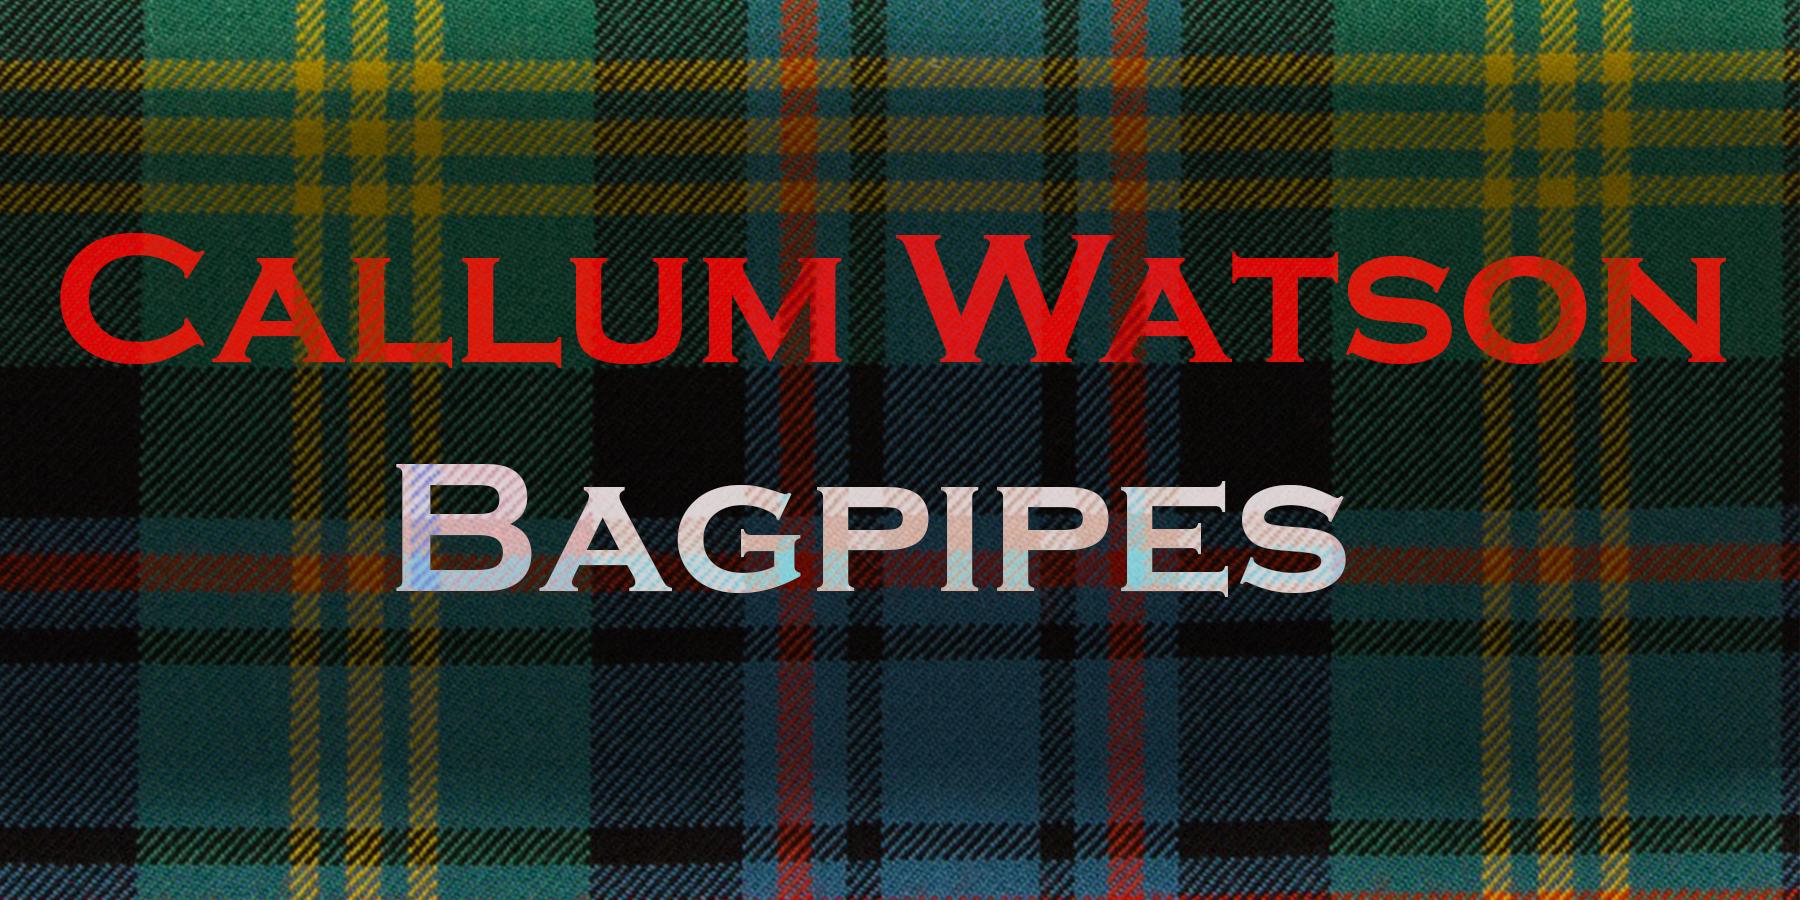 Callum Watson Bagpipes